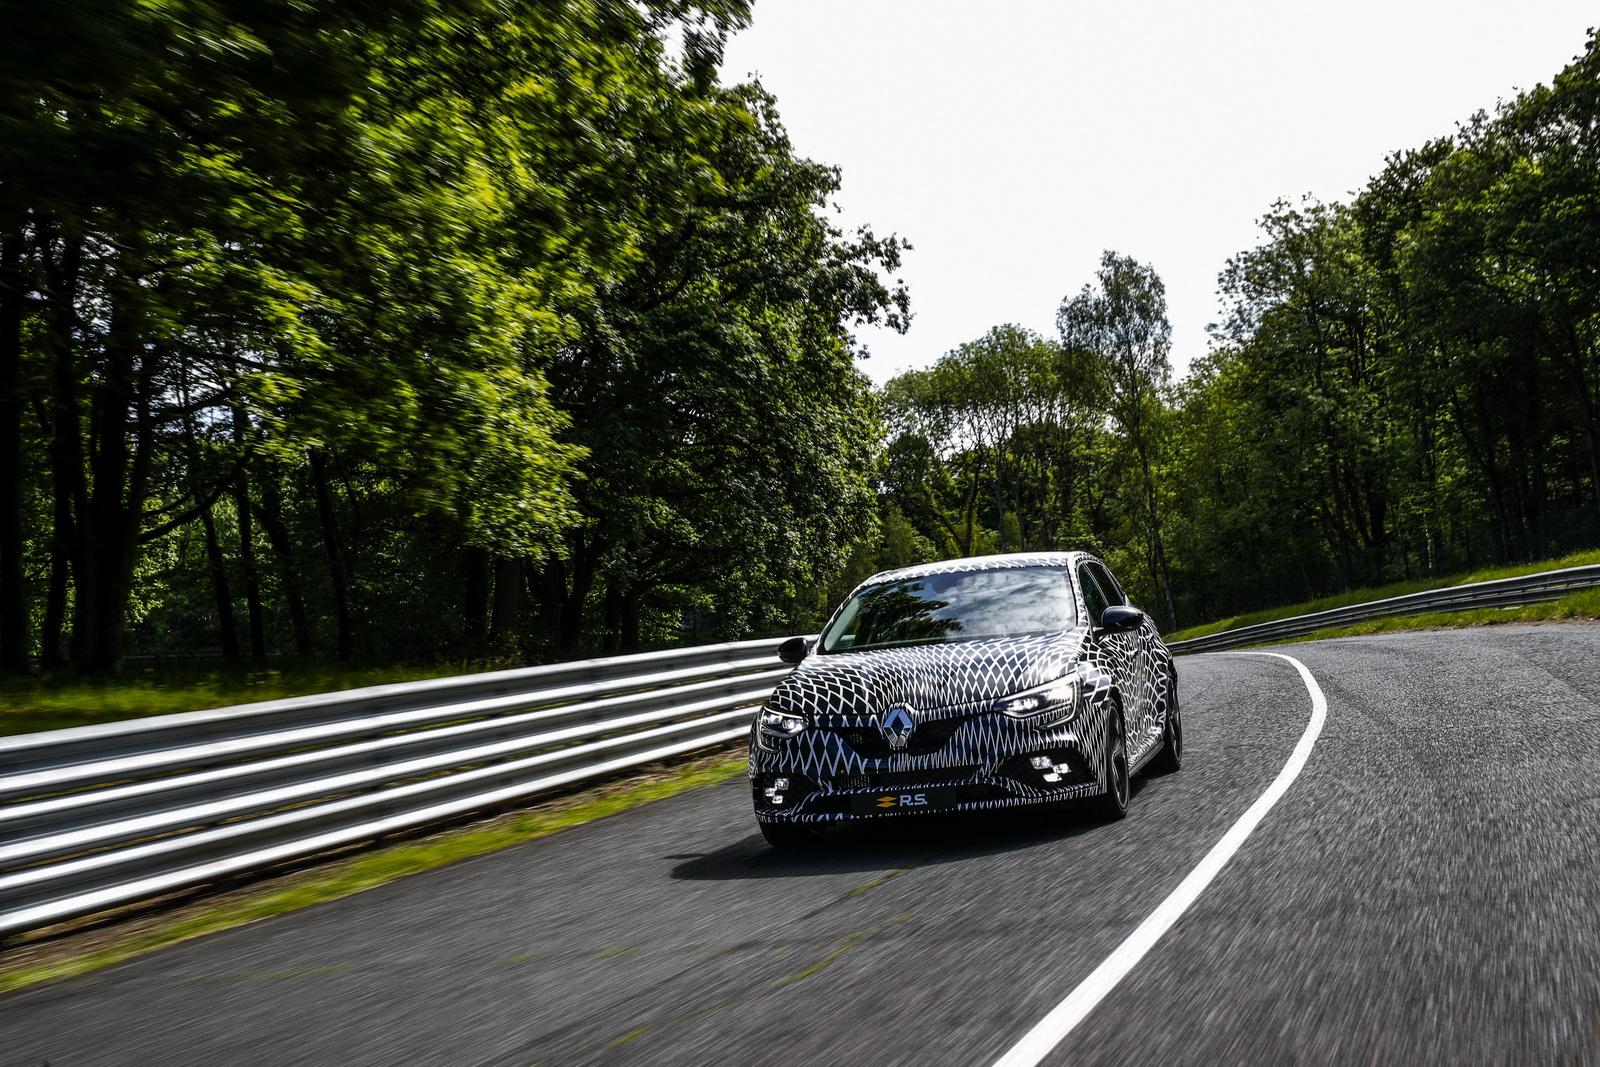 Renault_Megane_RS_11